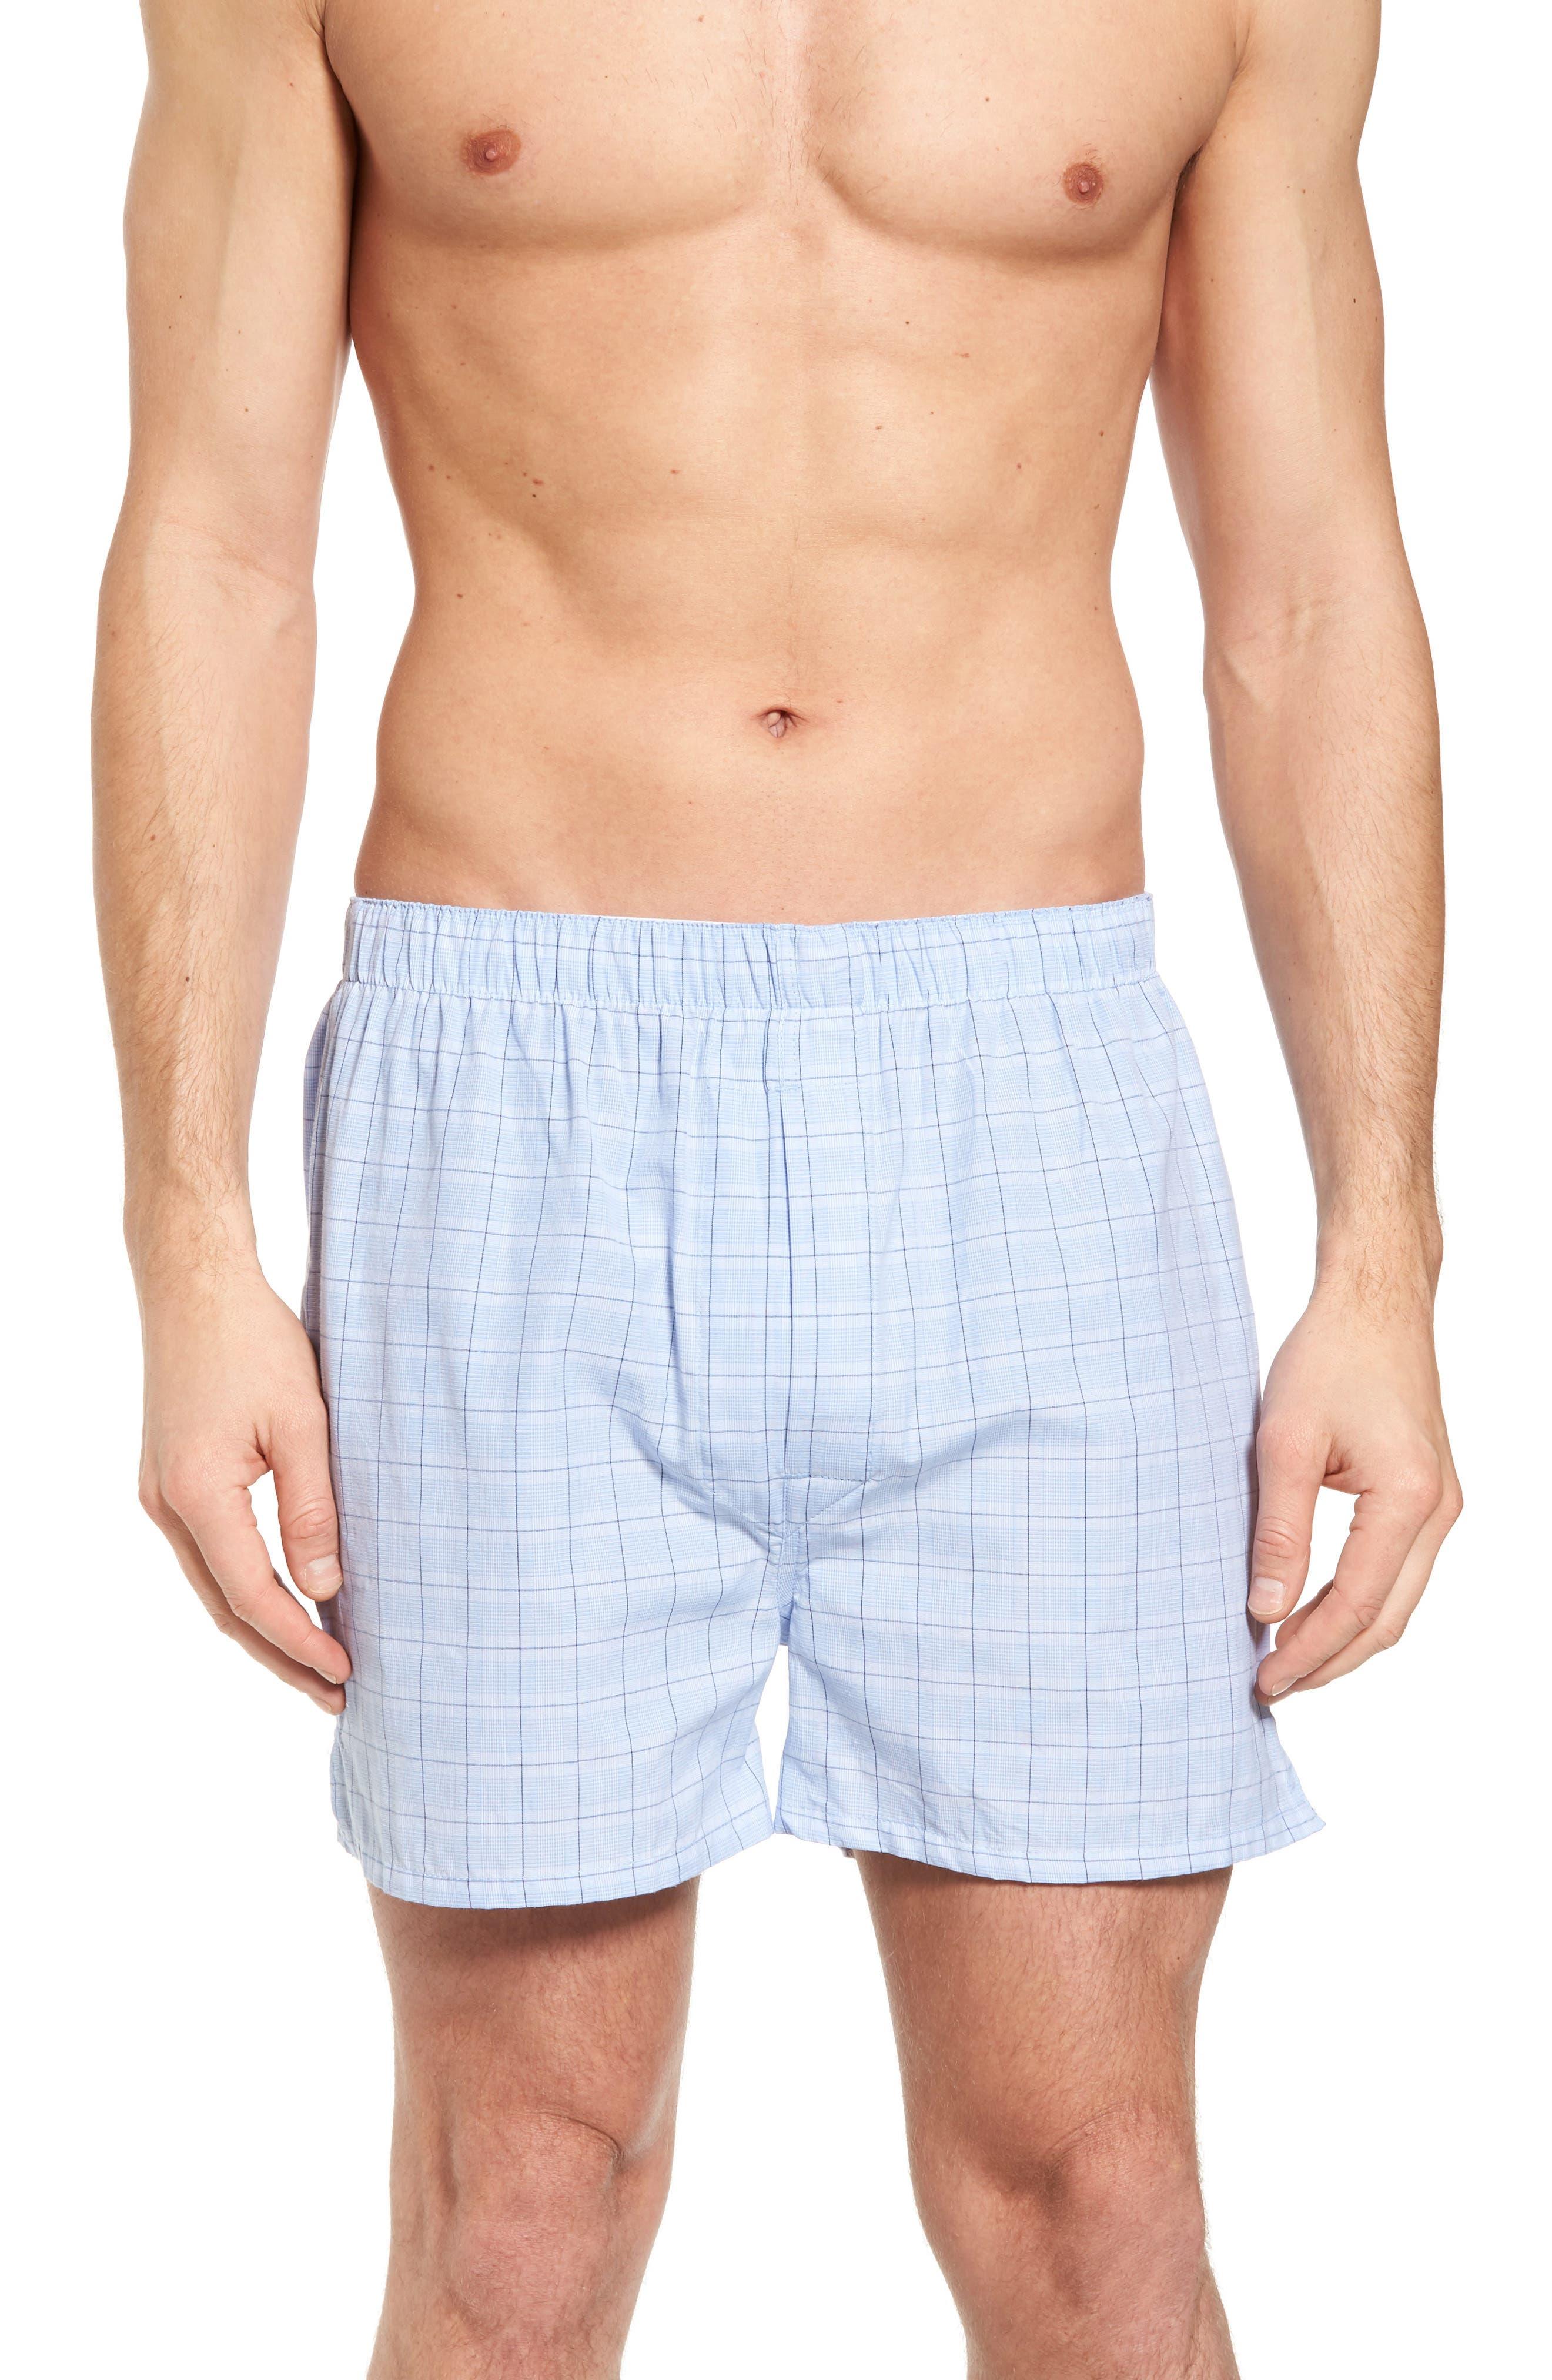 Majestic Boxer Shorts,                         Main,                         color, Light Blue Check